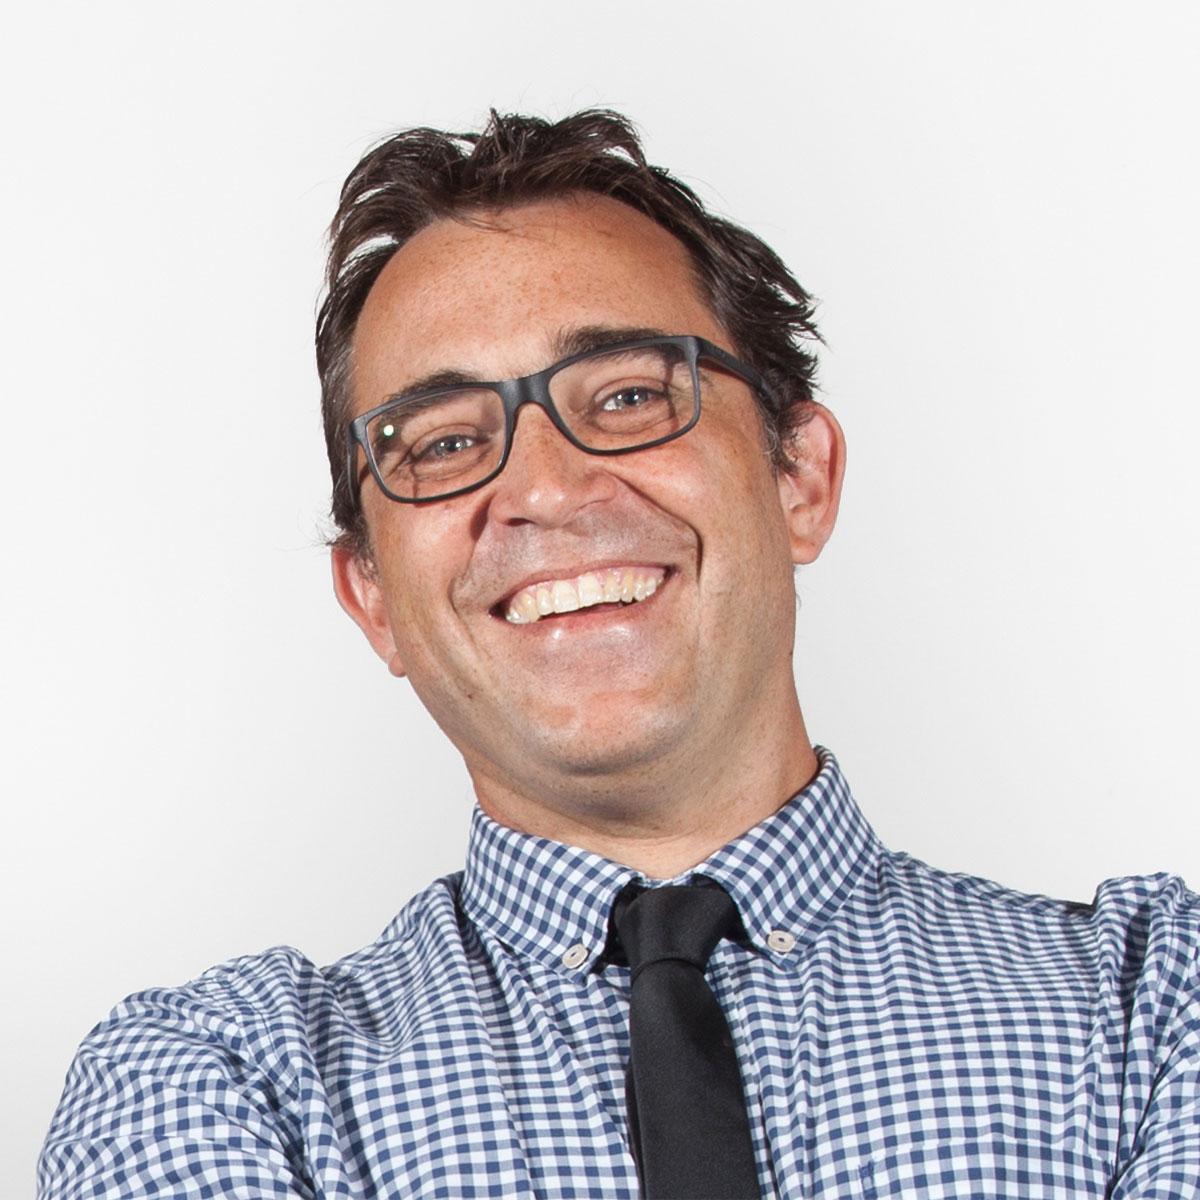 Outgoing WAYJO General Manager Simon Keen